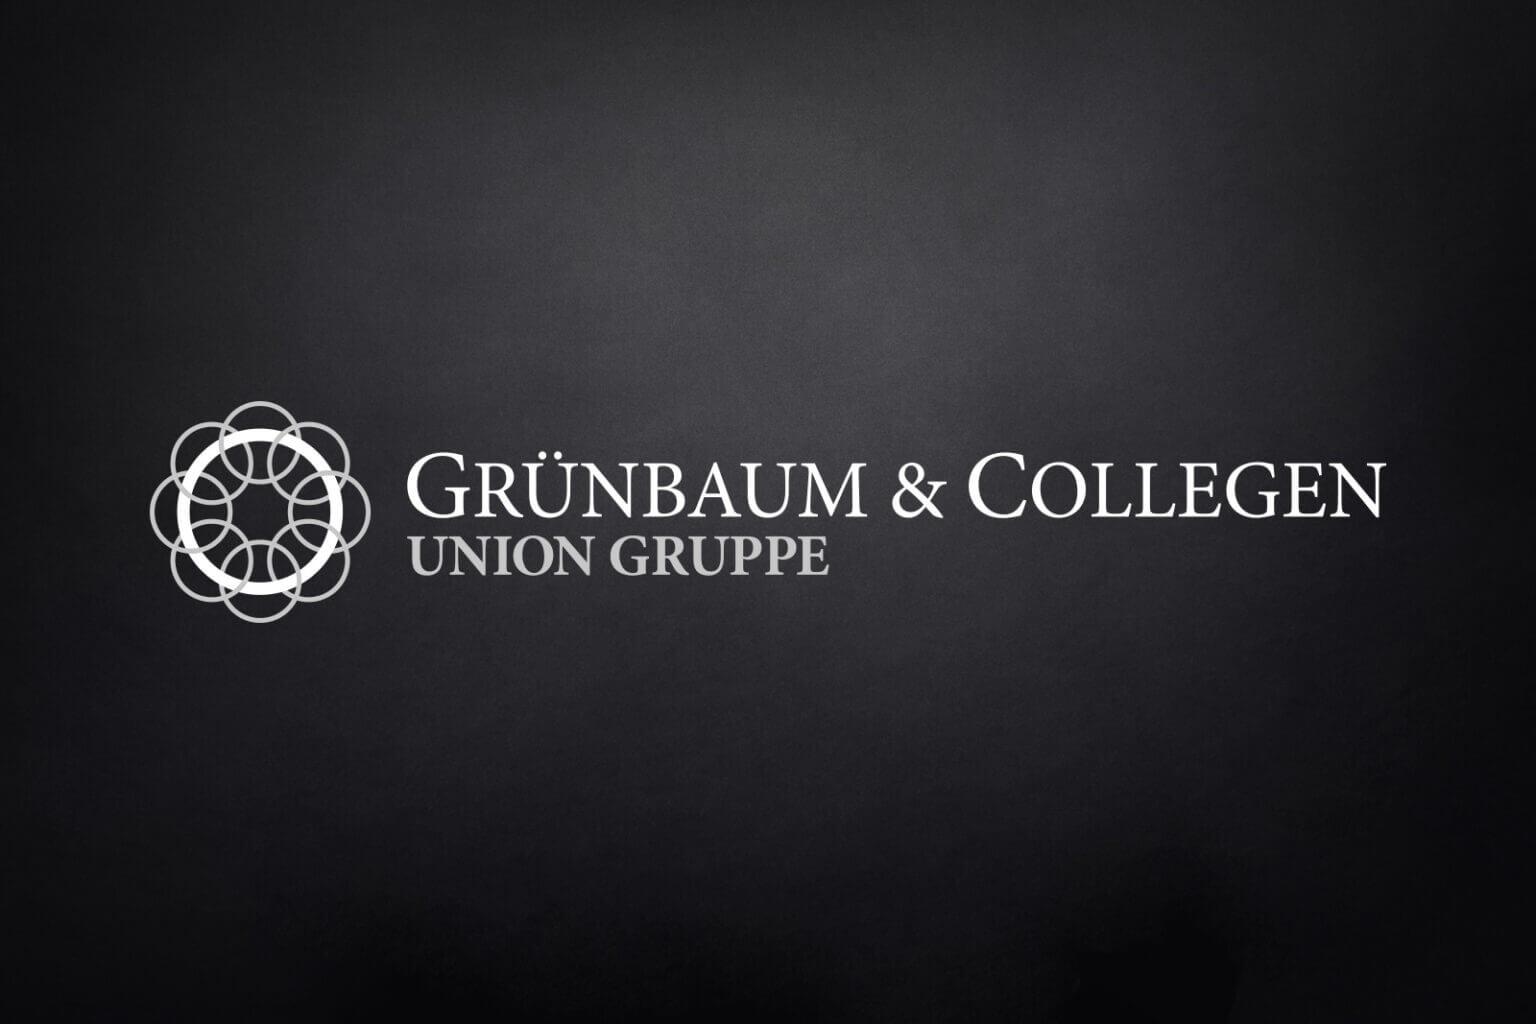 Union Gruppe - Grünbaum & Collegen - Team